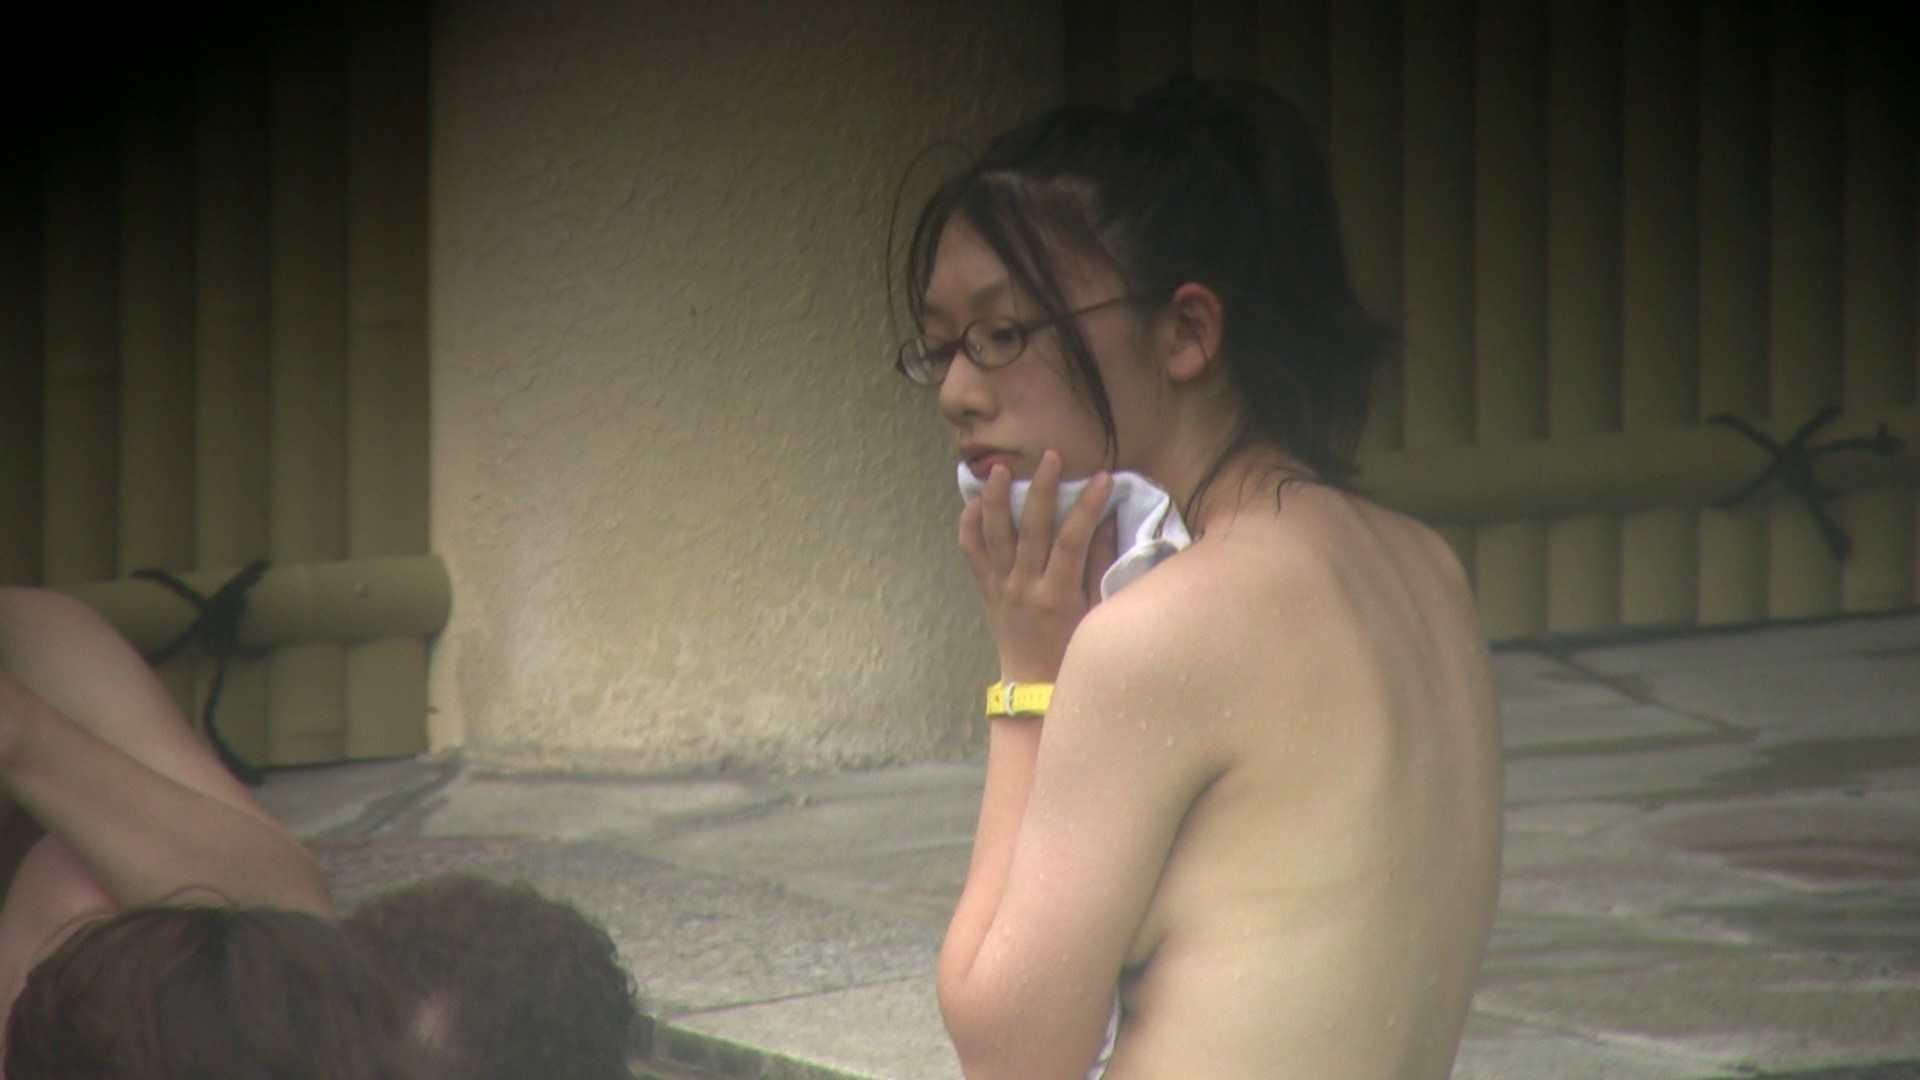 Aquaな露天風呂Vol.138 露天風呂突入   美しいOLの裸体  92pic 4